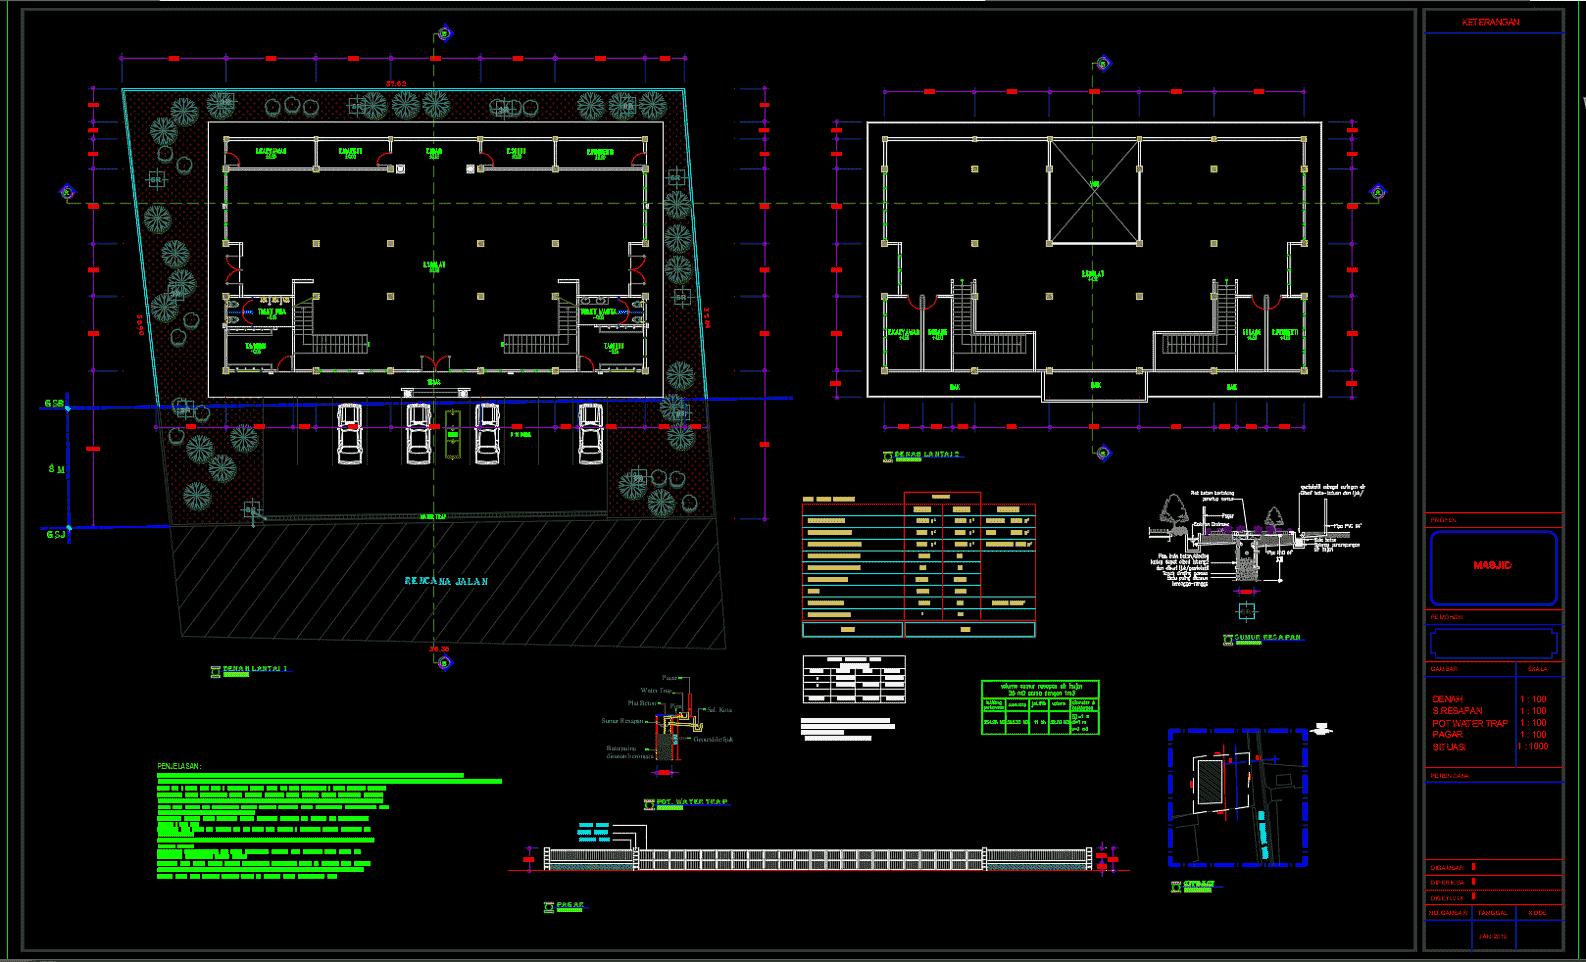 Download Gambar Masjid 2 Lantai Format DWG AutoCAD Asdar Id